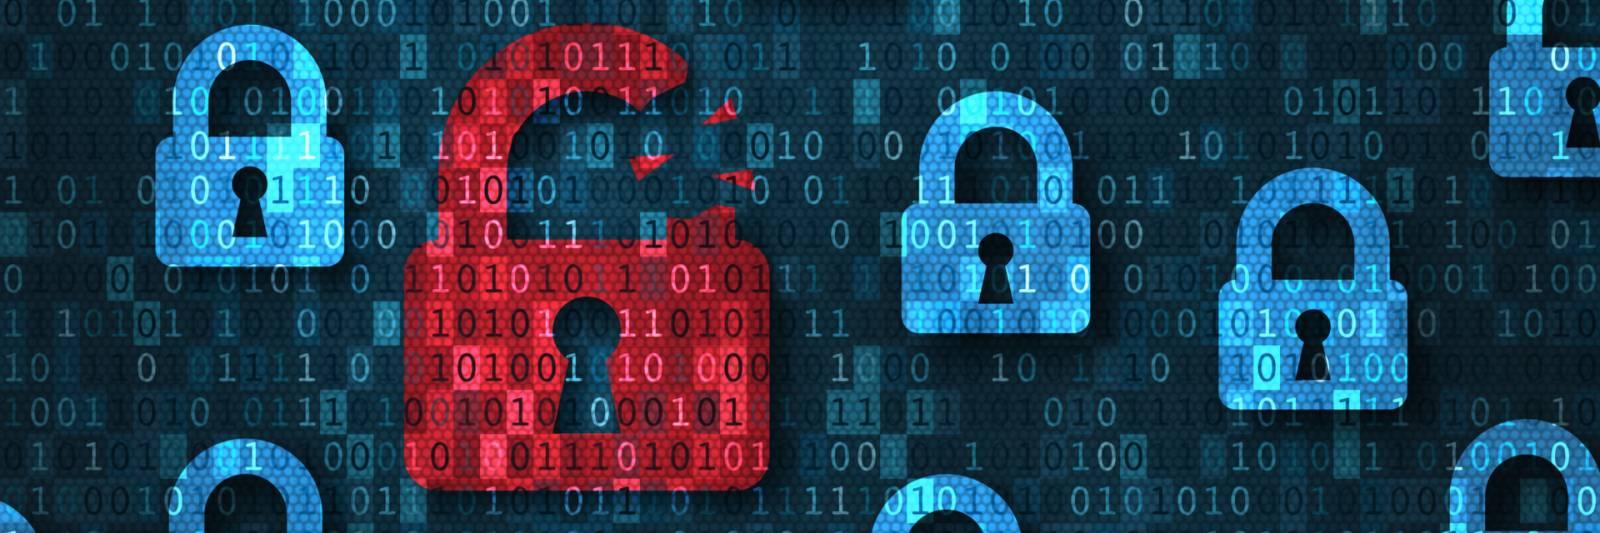 Weekly Threat Roundup: Microsoft Exchange, Chrome, Spectre